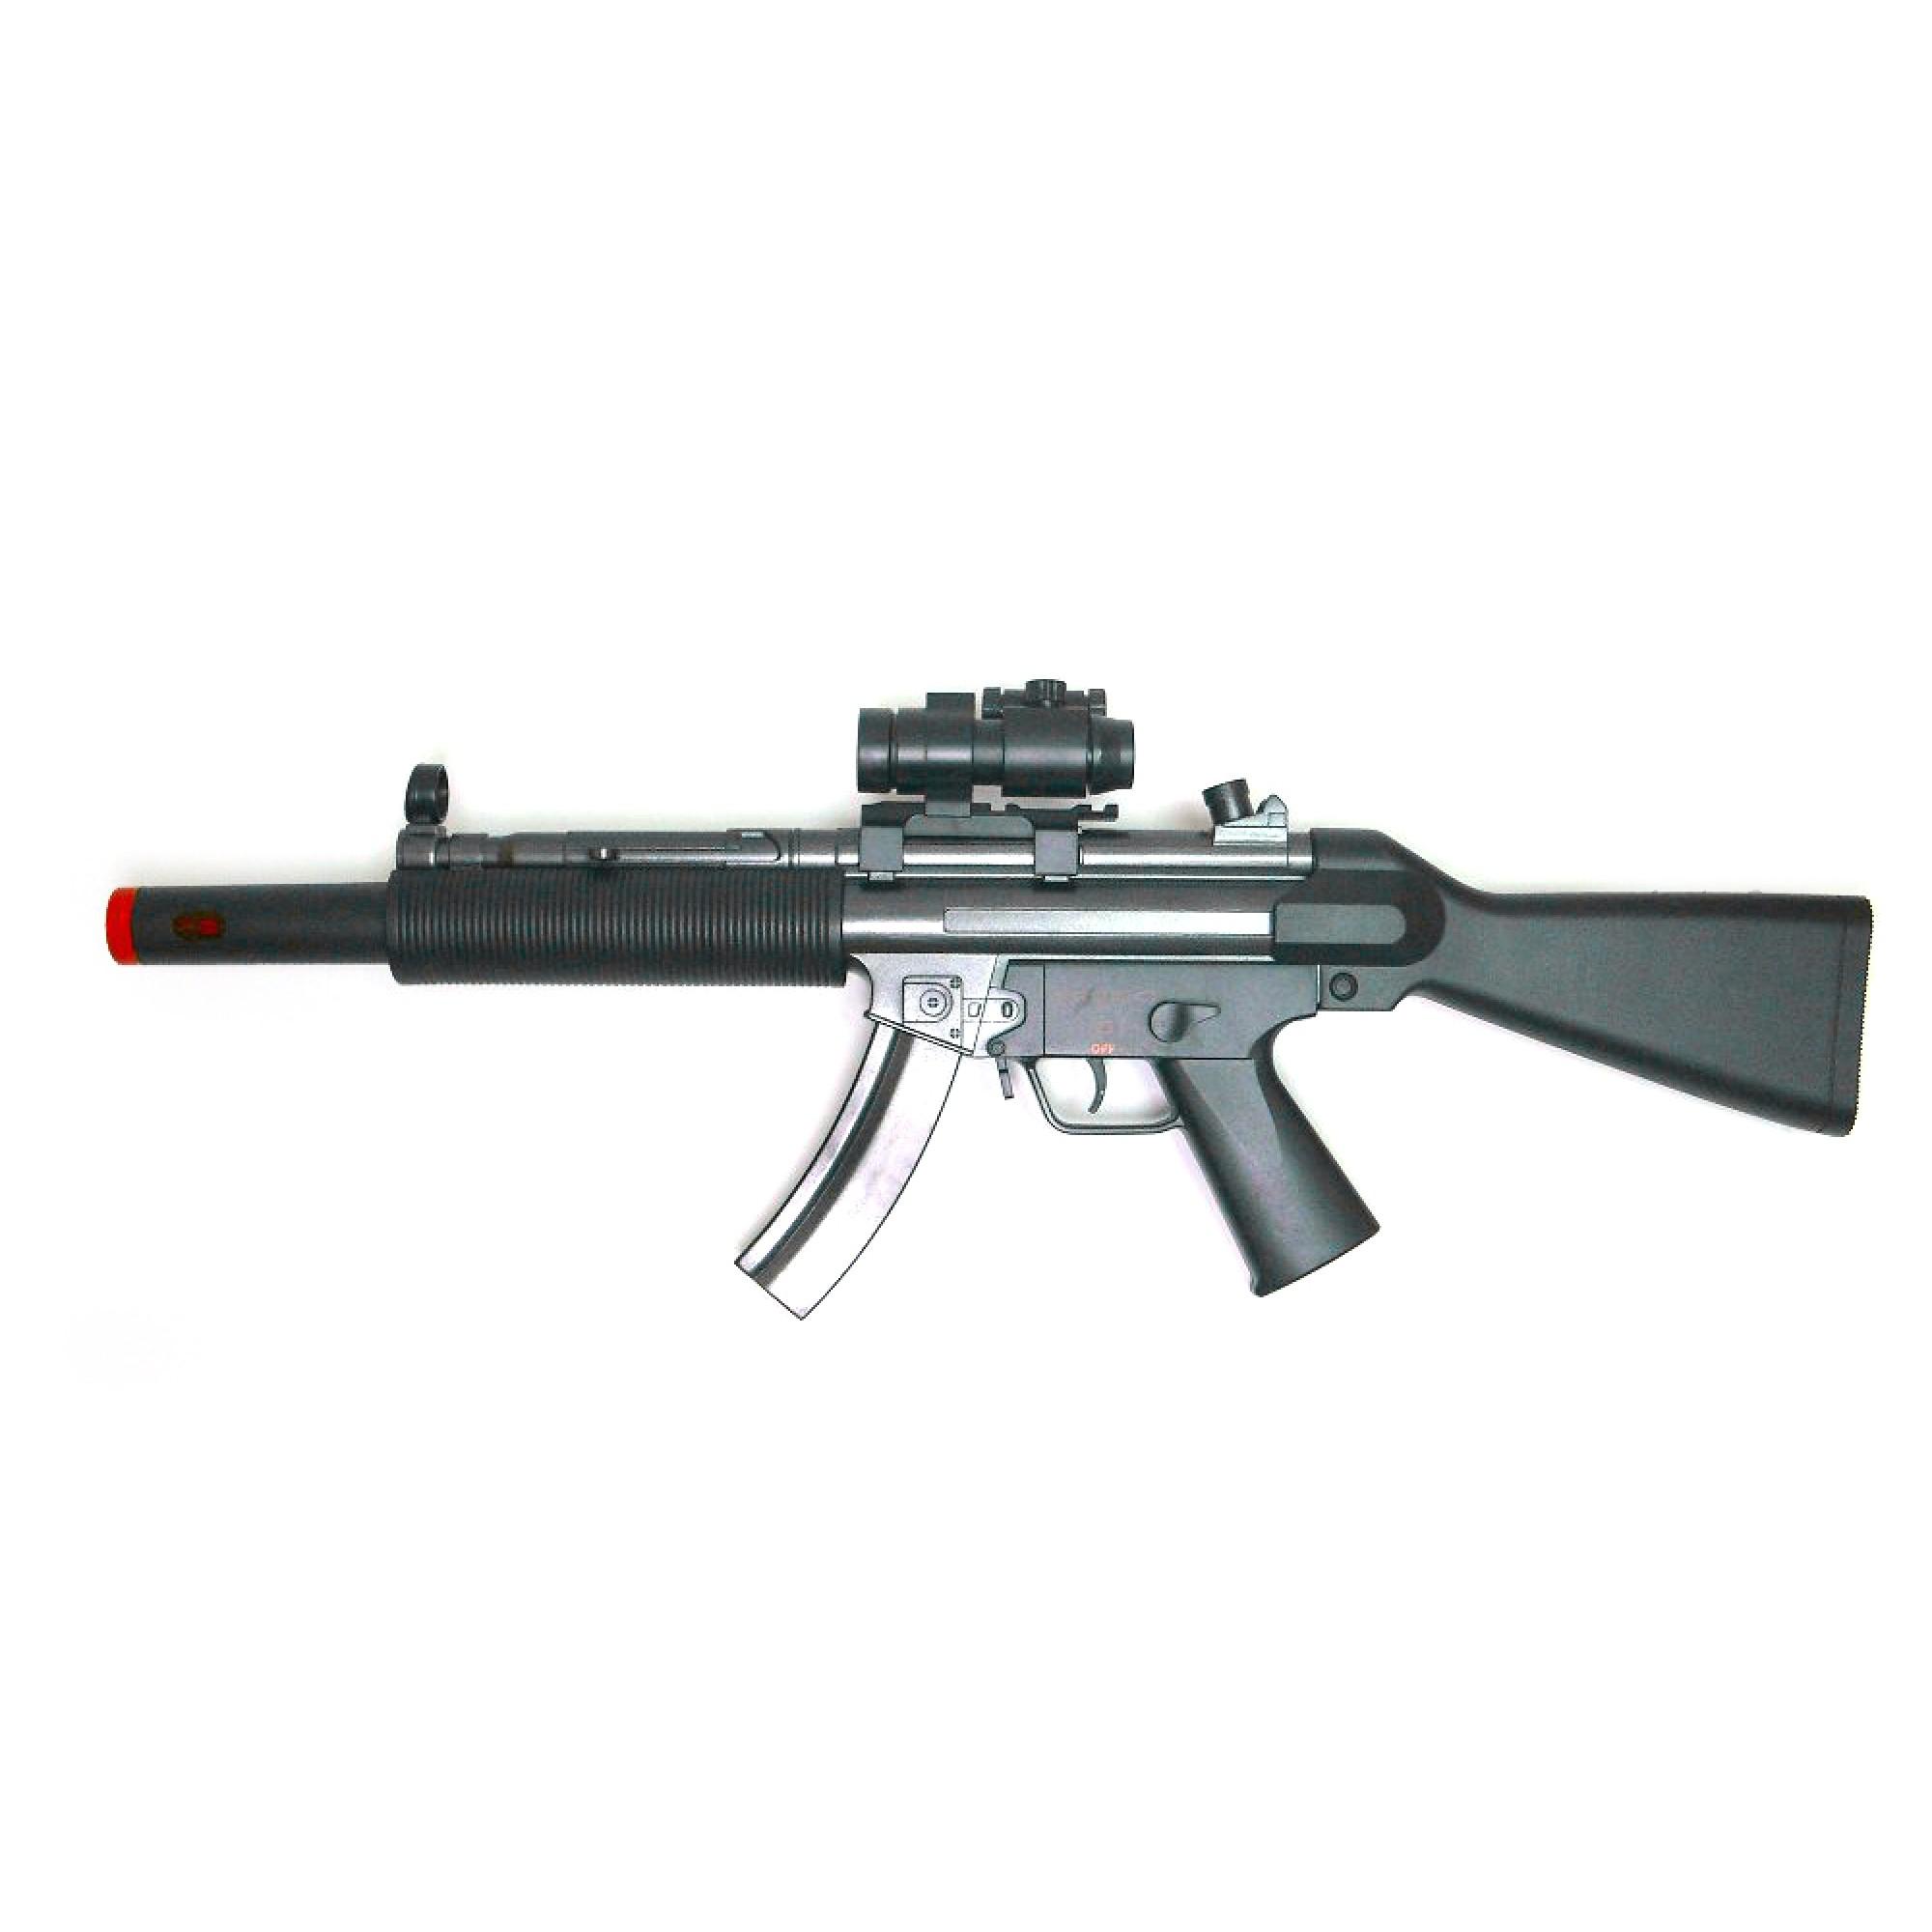 MP5 SD5 W/Light, Sound, Vibration & Viewer